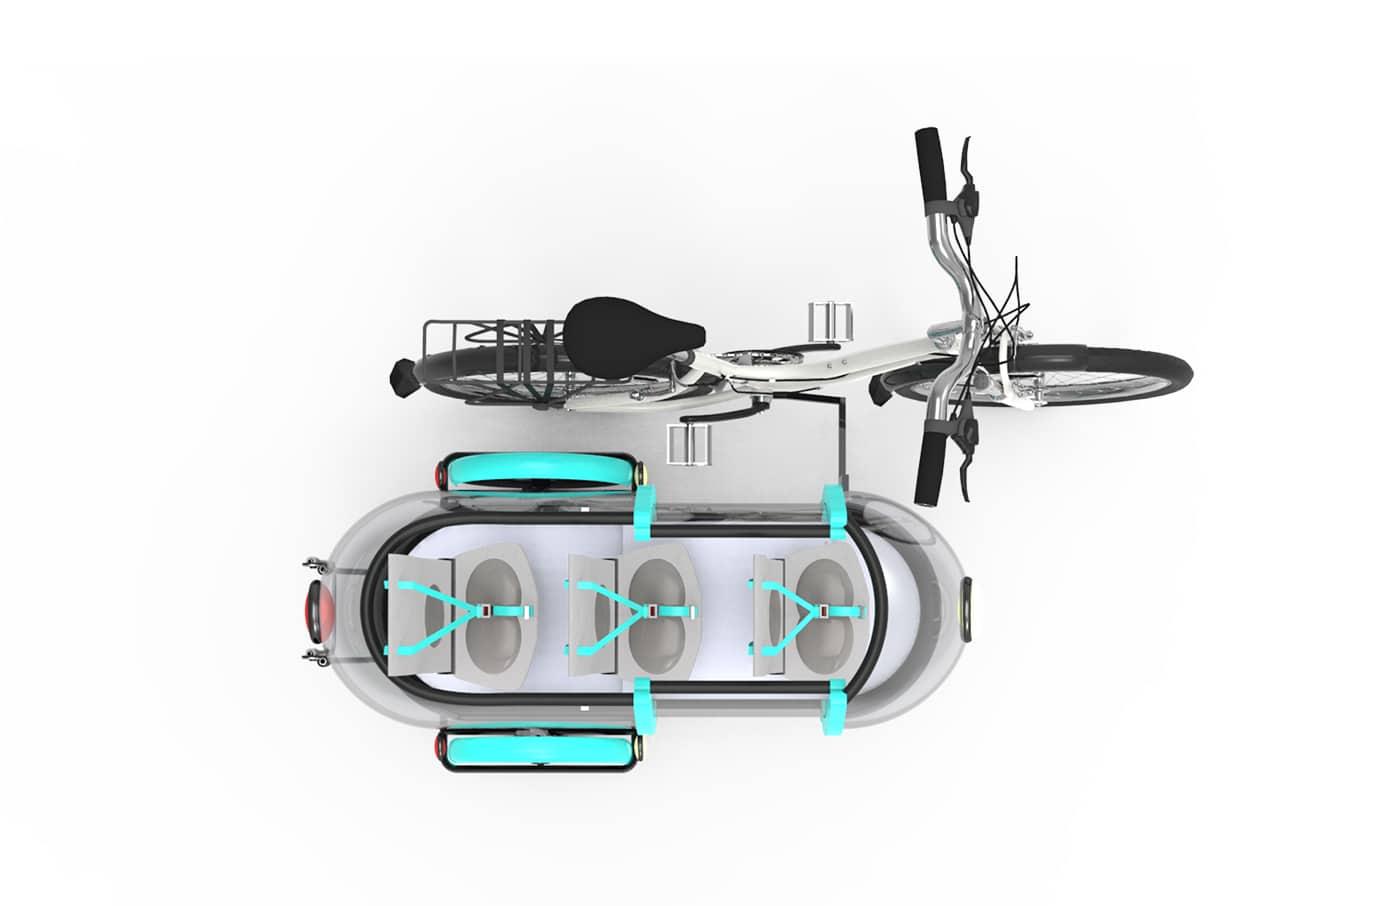 SideBuddy-by-Jordi-Hans-Design-Bycycle-Trailer,-Cargo-Bike,-Side-Trailer,-Kid-Bike-trailer,-by-Jonkoping-Sweden-Design-Consuting